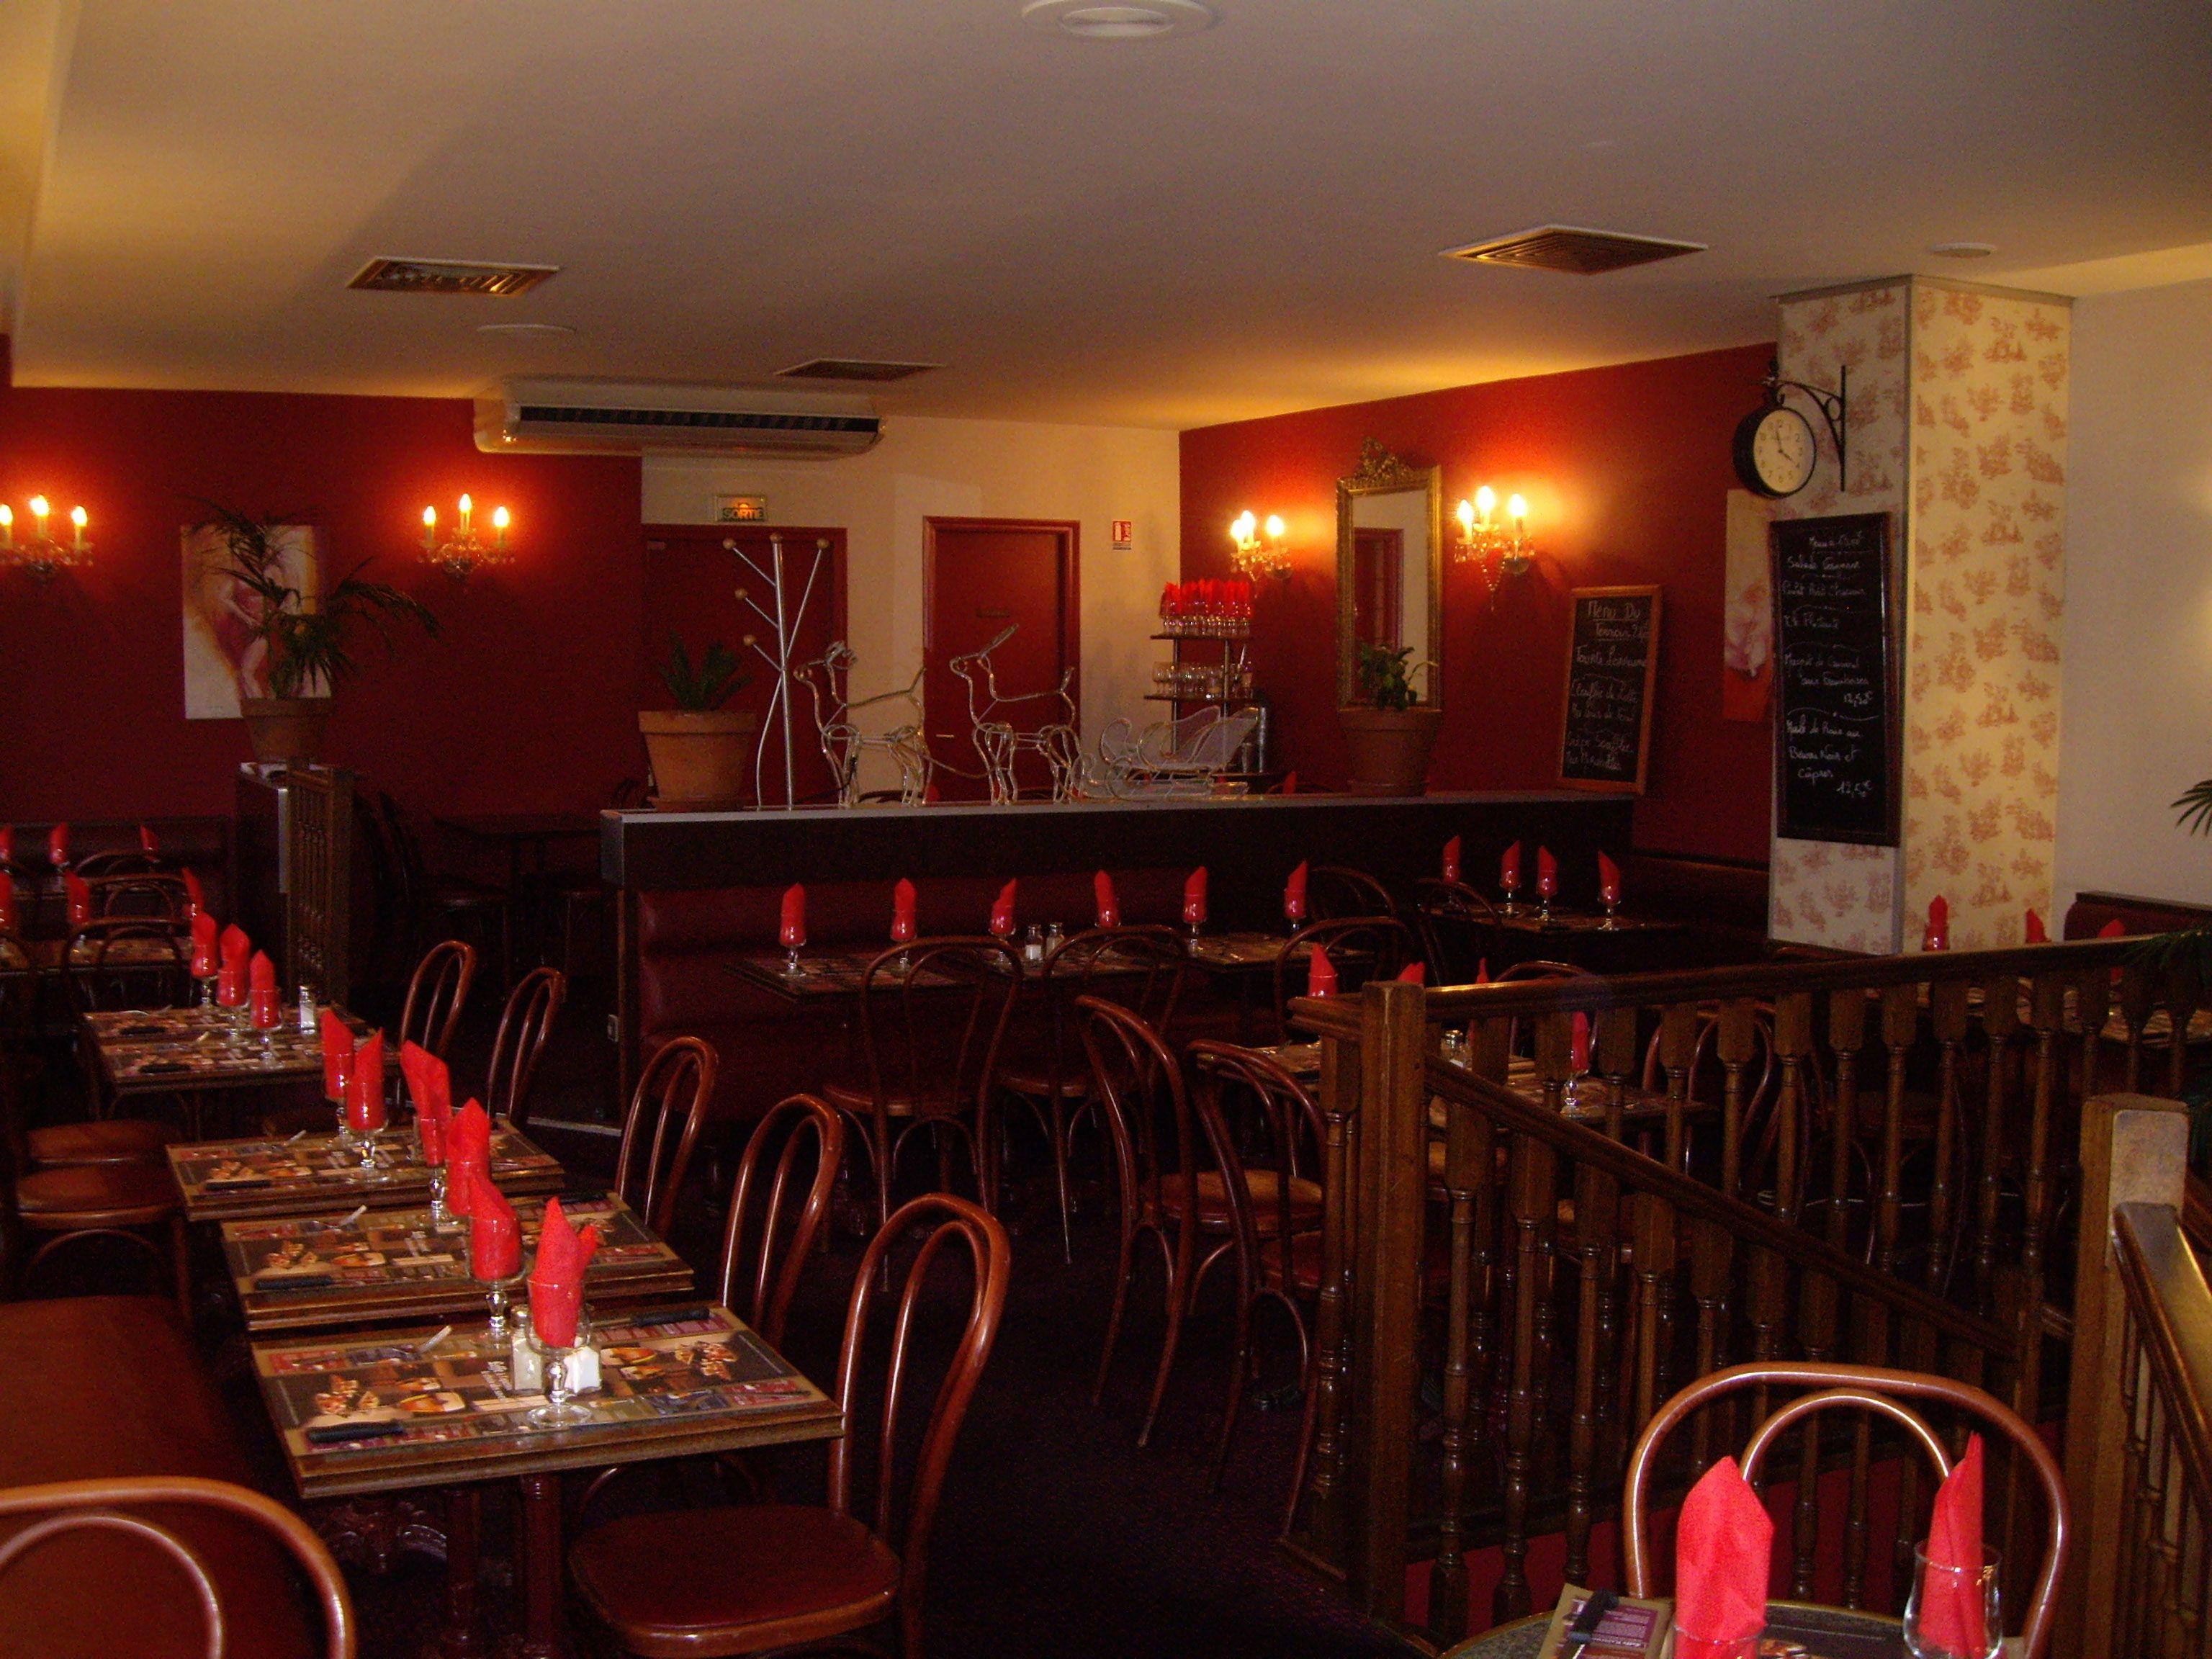 Restaurant le grand cafe restaurant 54000 nancy site for Restaurant madame nancy